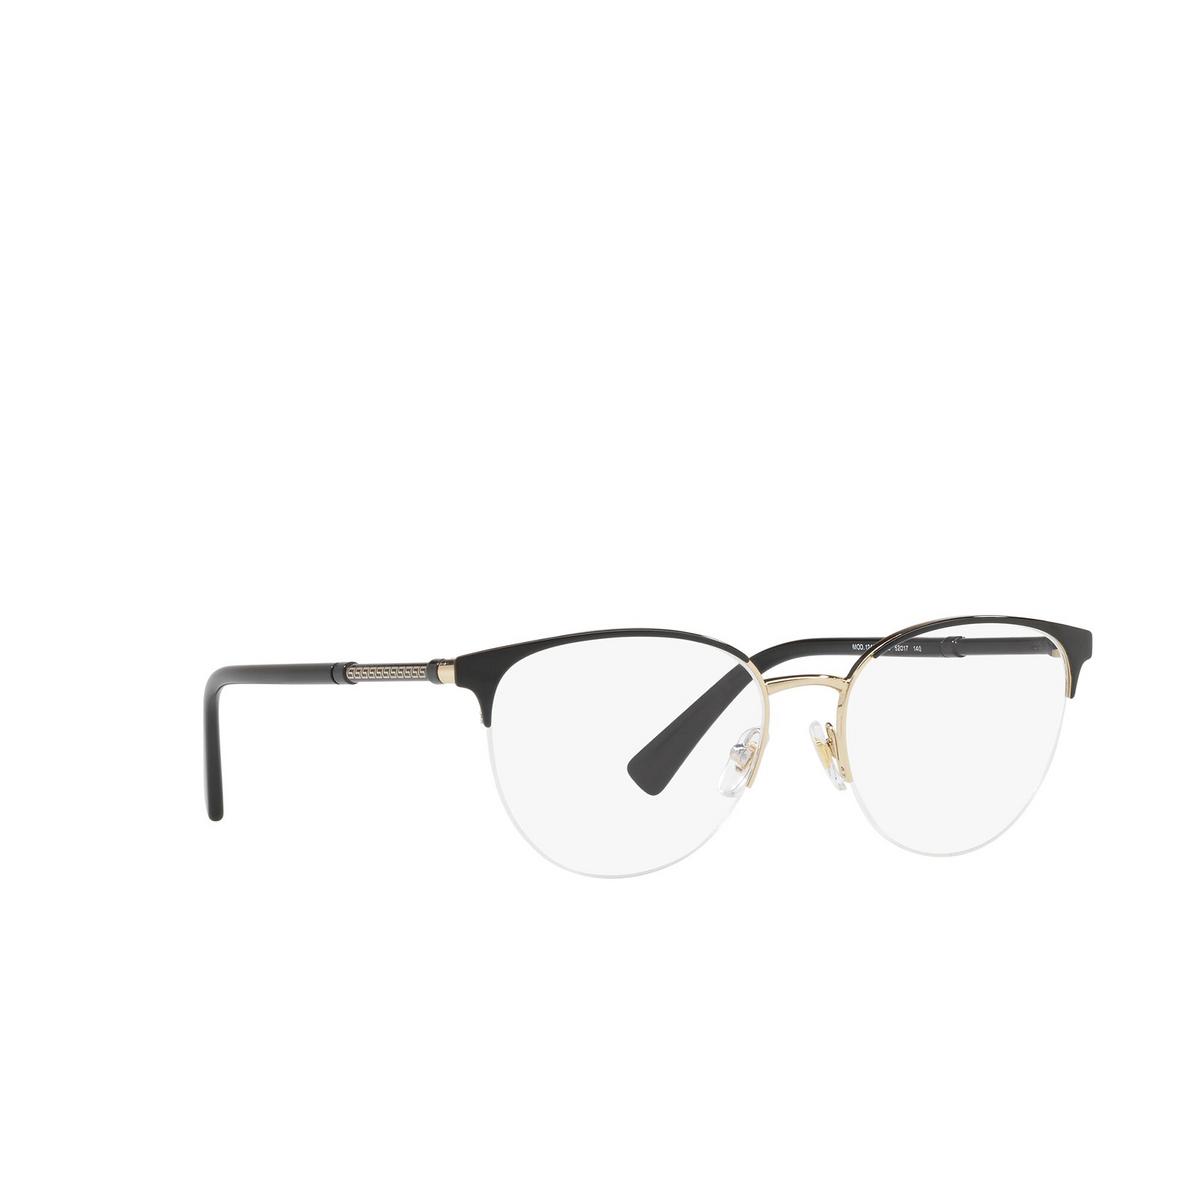 Versace® Round Eyeglasses: VE1247 color Black / Pale Gold 1252.